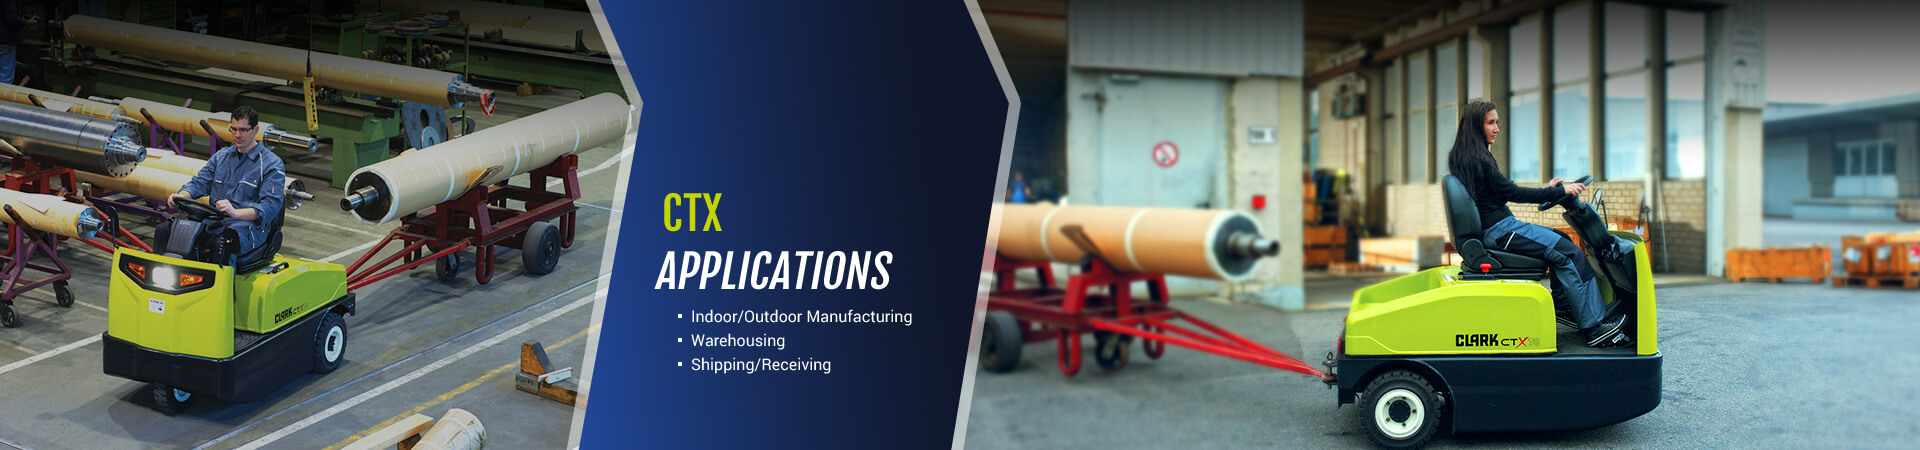 Clark Material Handling Company Forklifts Cgc25 Forklift Wiring Diagram Bg